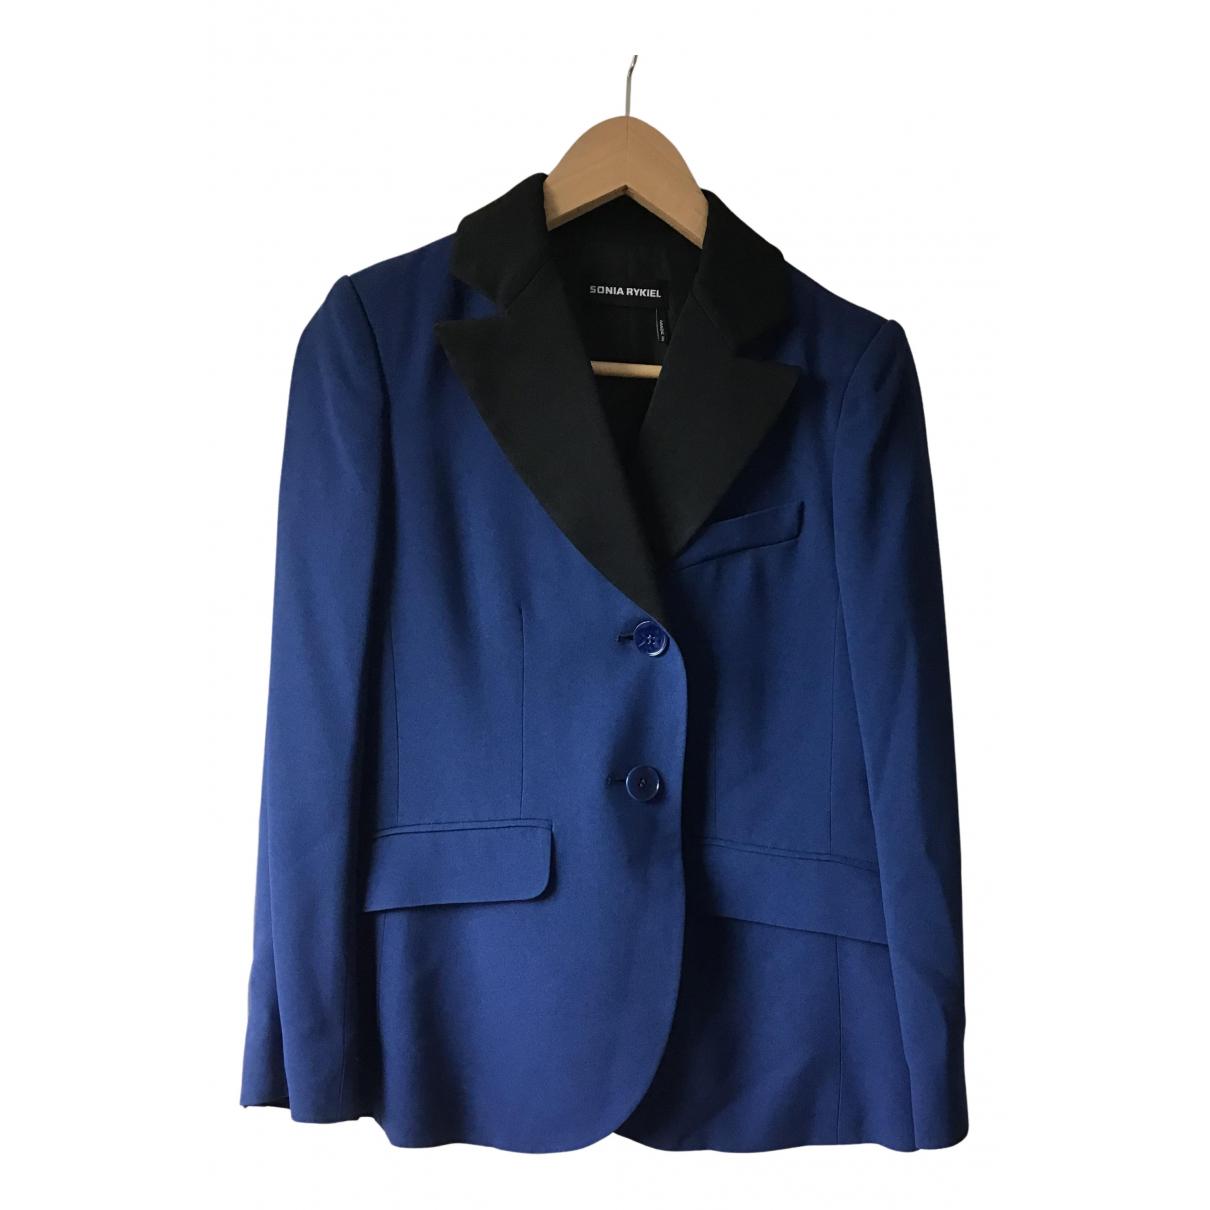 Sonia Rykiel - Veste   pour femme - bleu